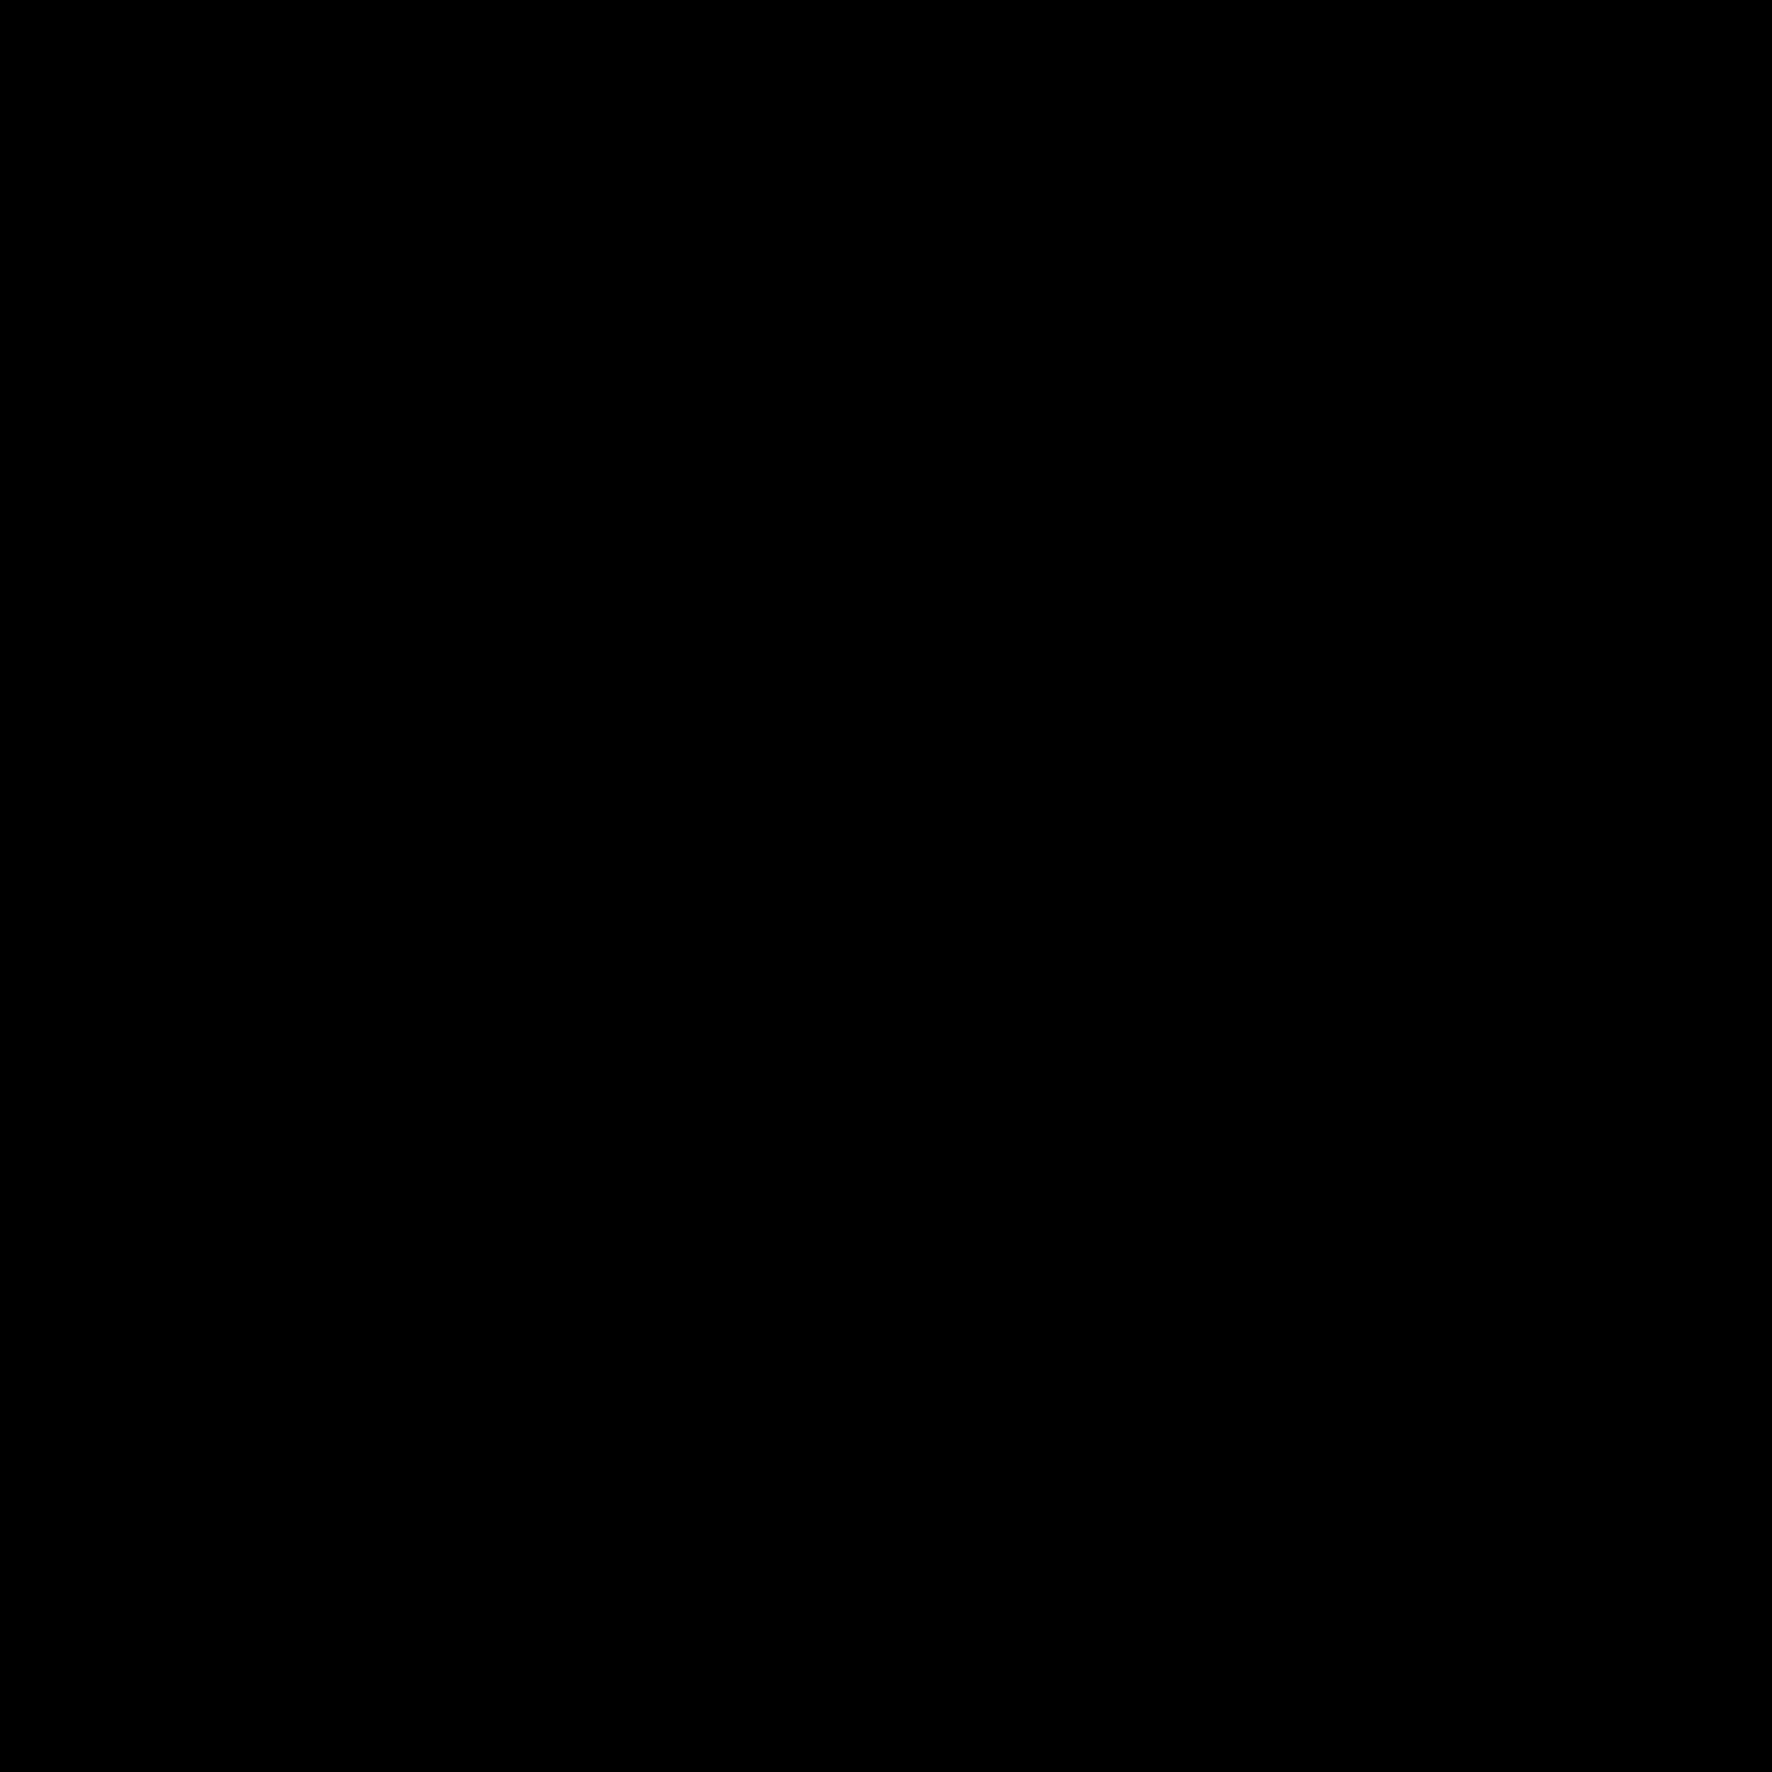 Kleur N° 33 (Zwart)